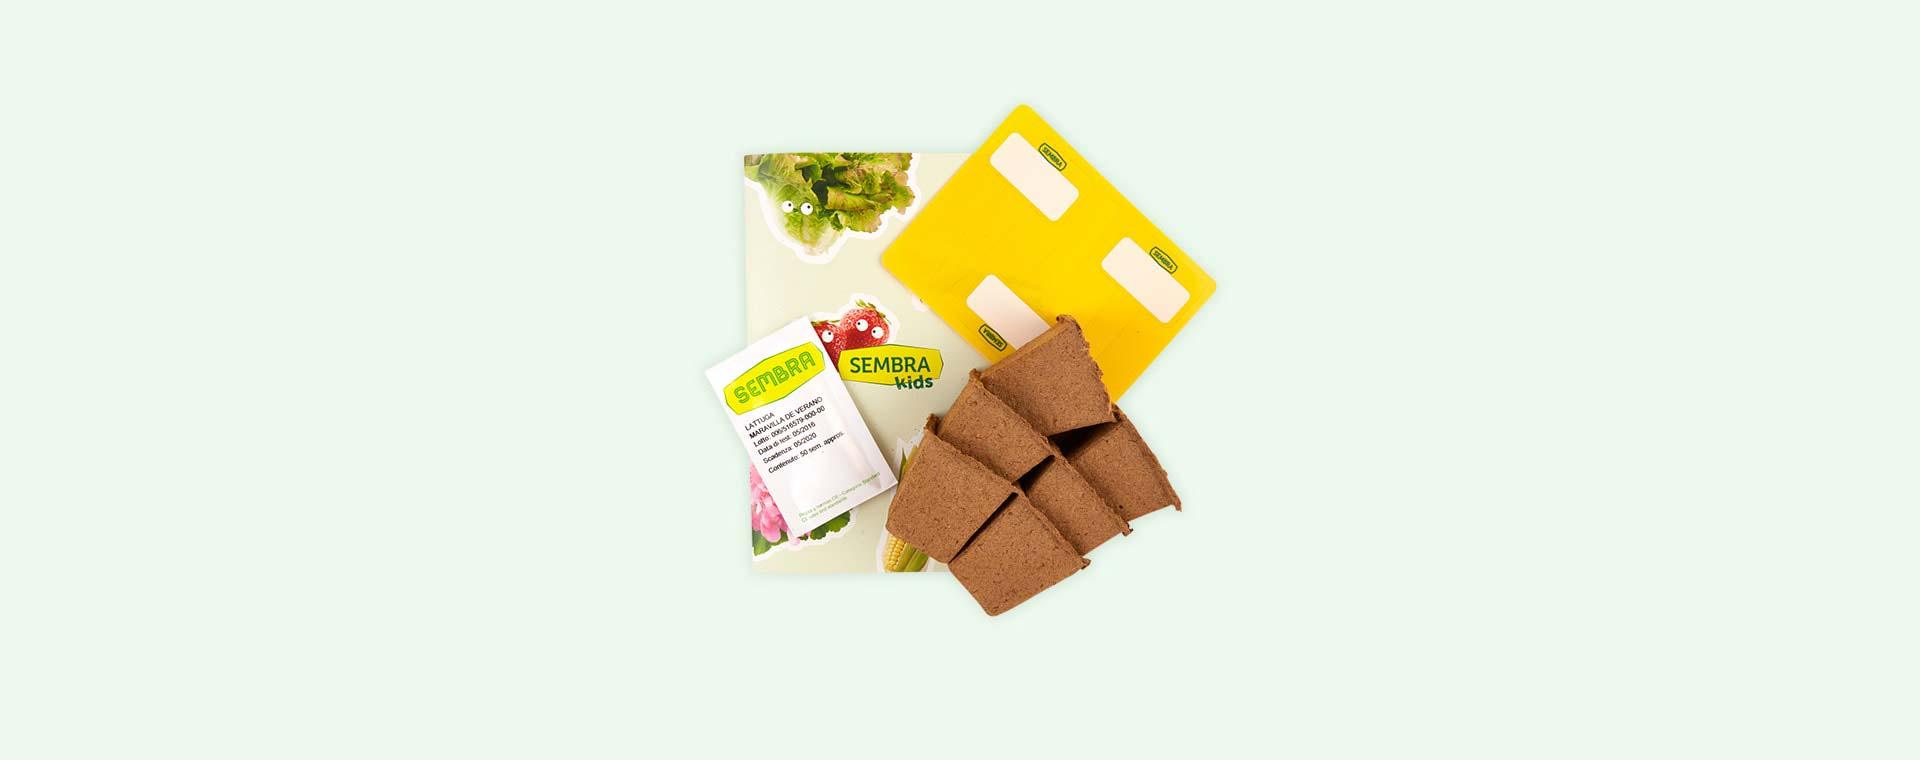 Lettuce Sembra Kids Standard Kit